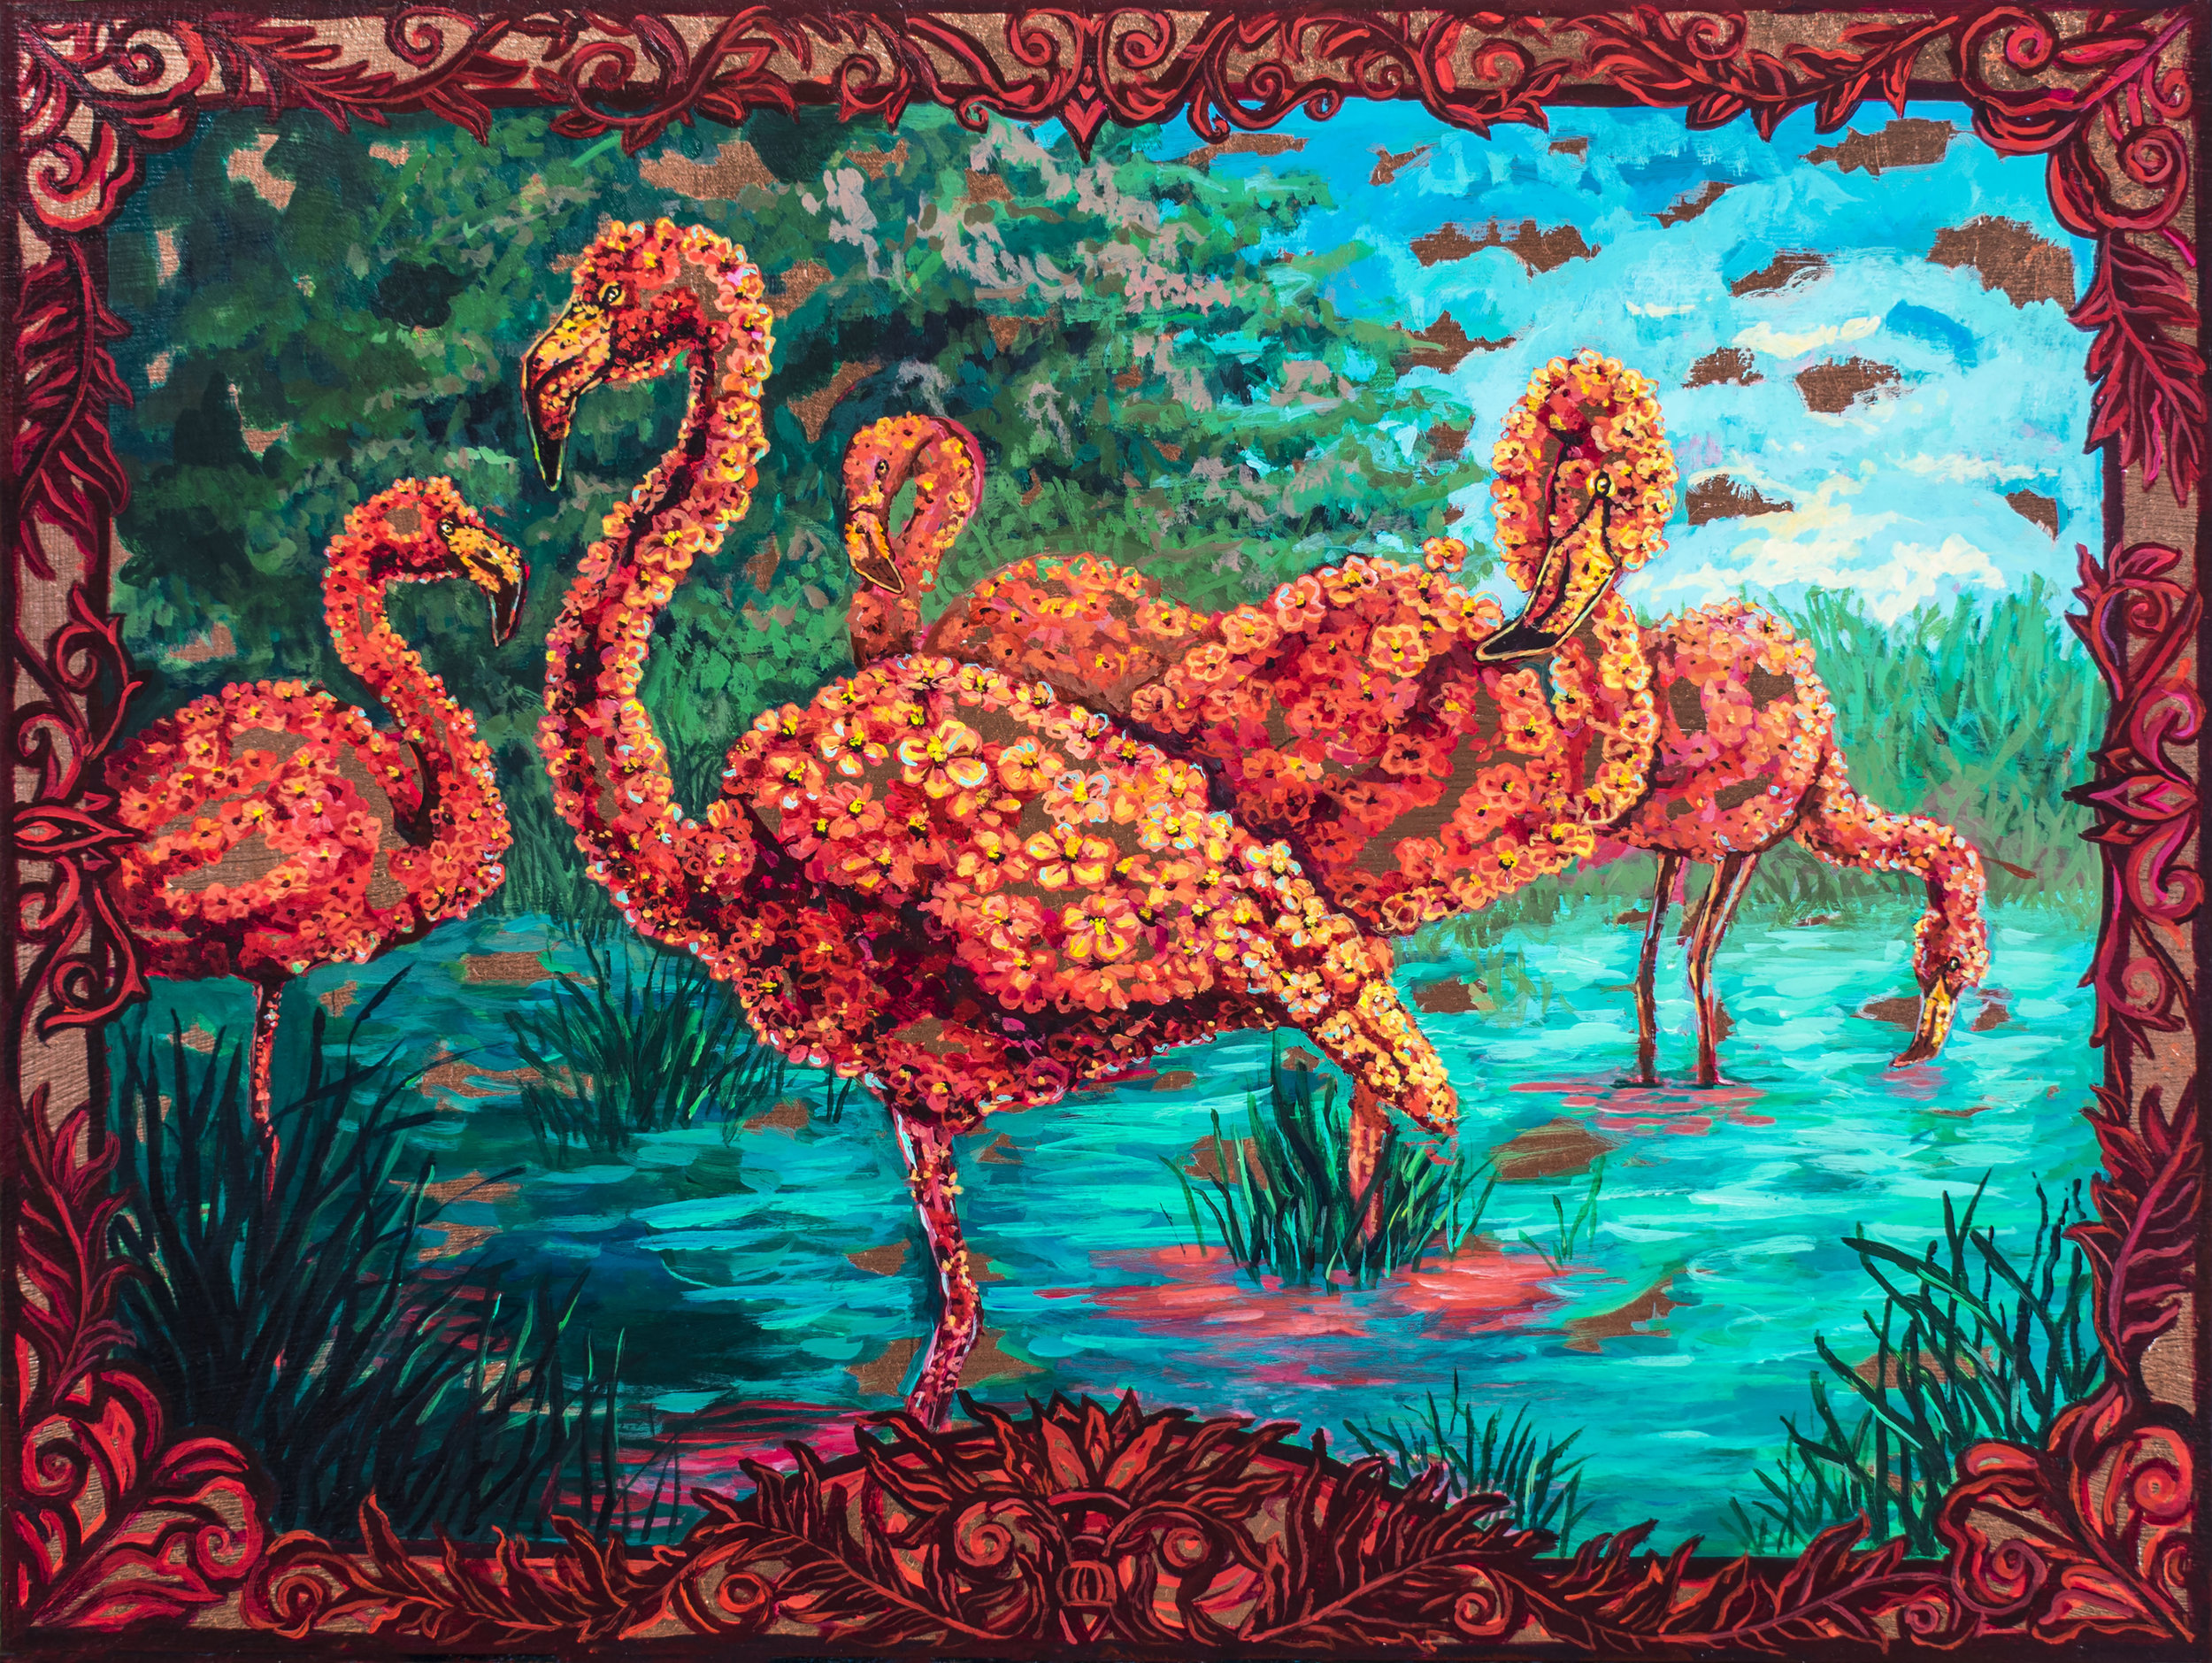 FlamingoJPg.jpg